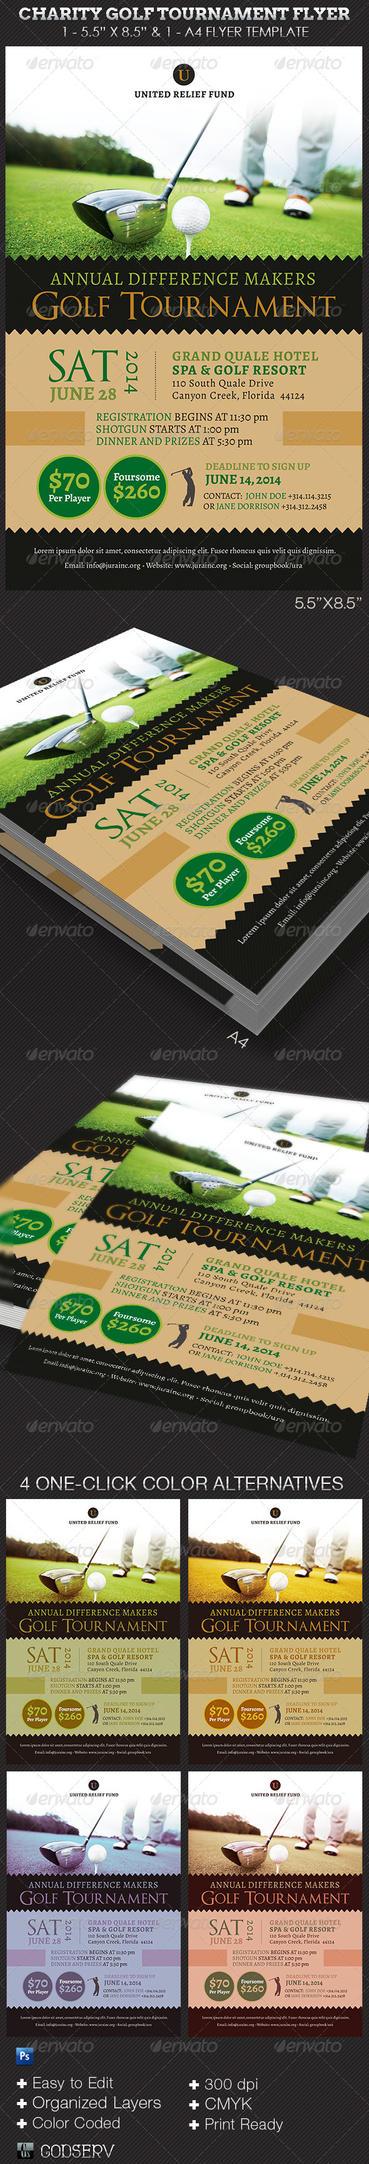 charity golf tournament flyer template by godserv on deviantart. Black Bedroom Furniture Sets. Home Design Ideas